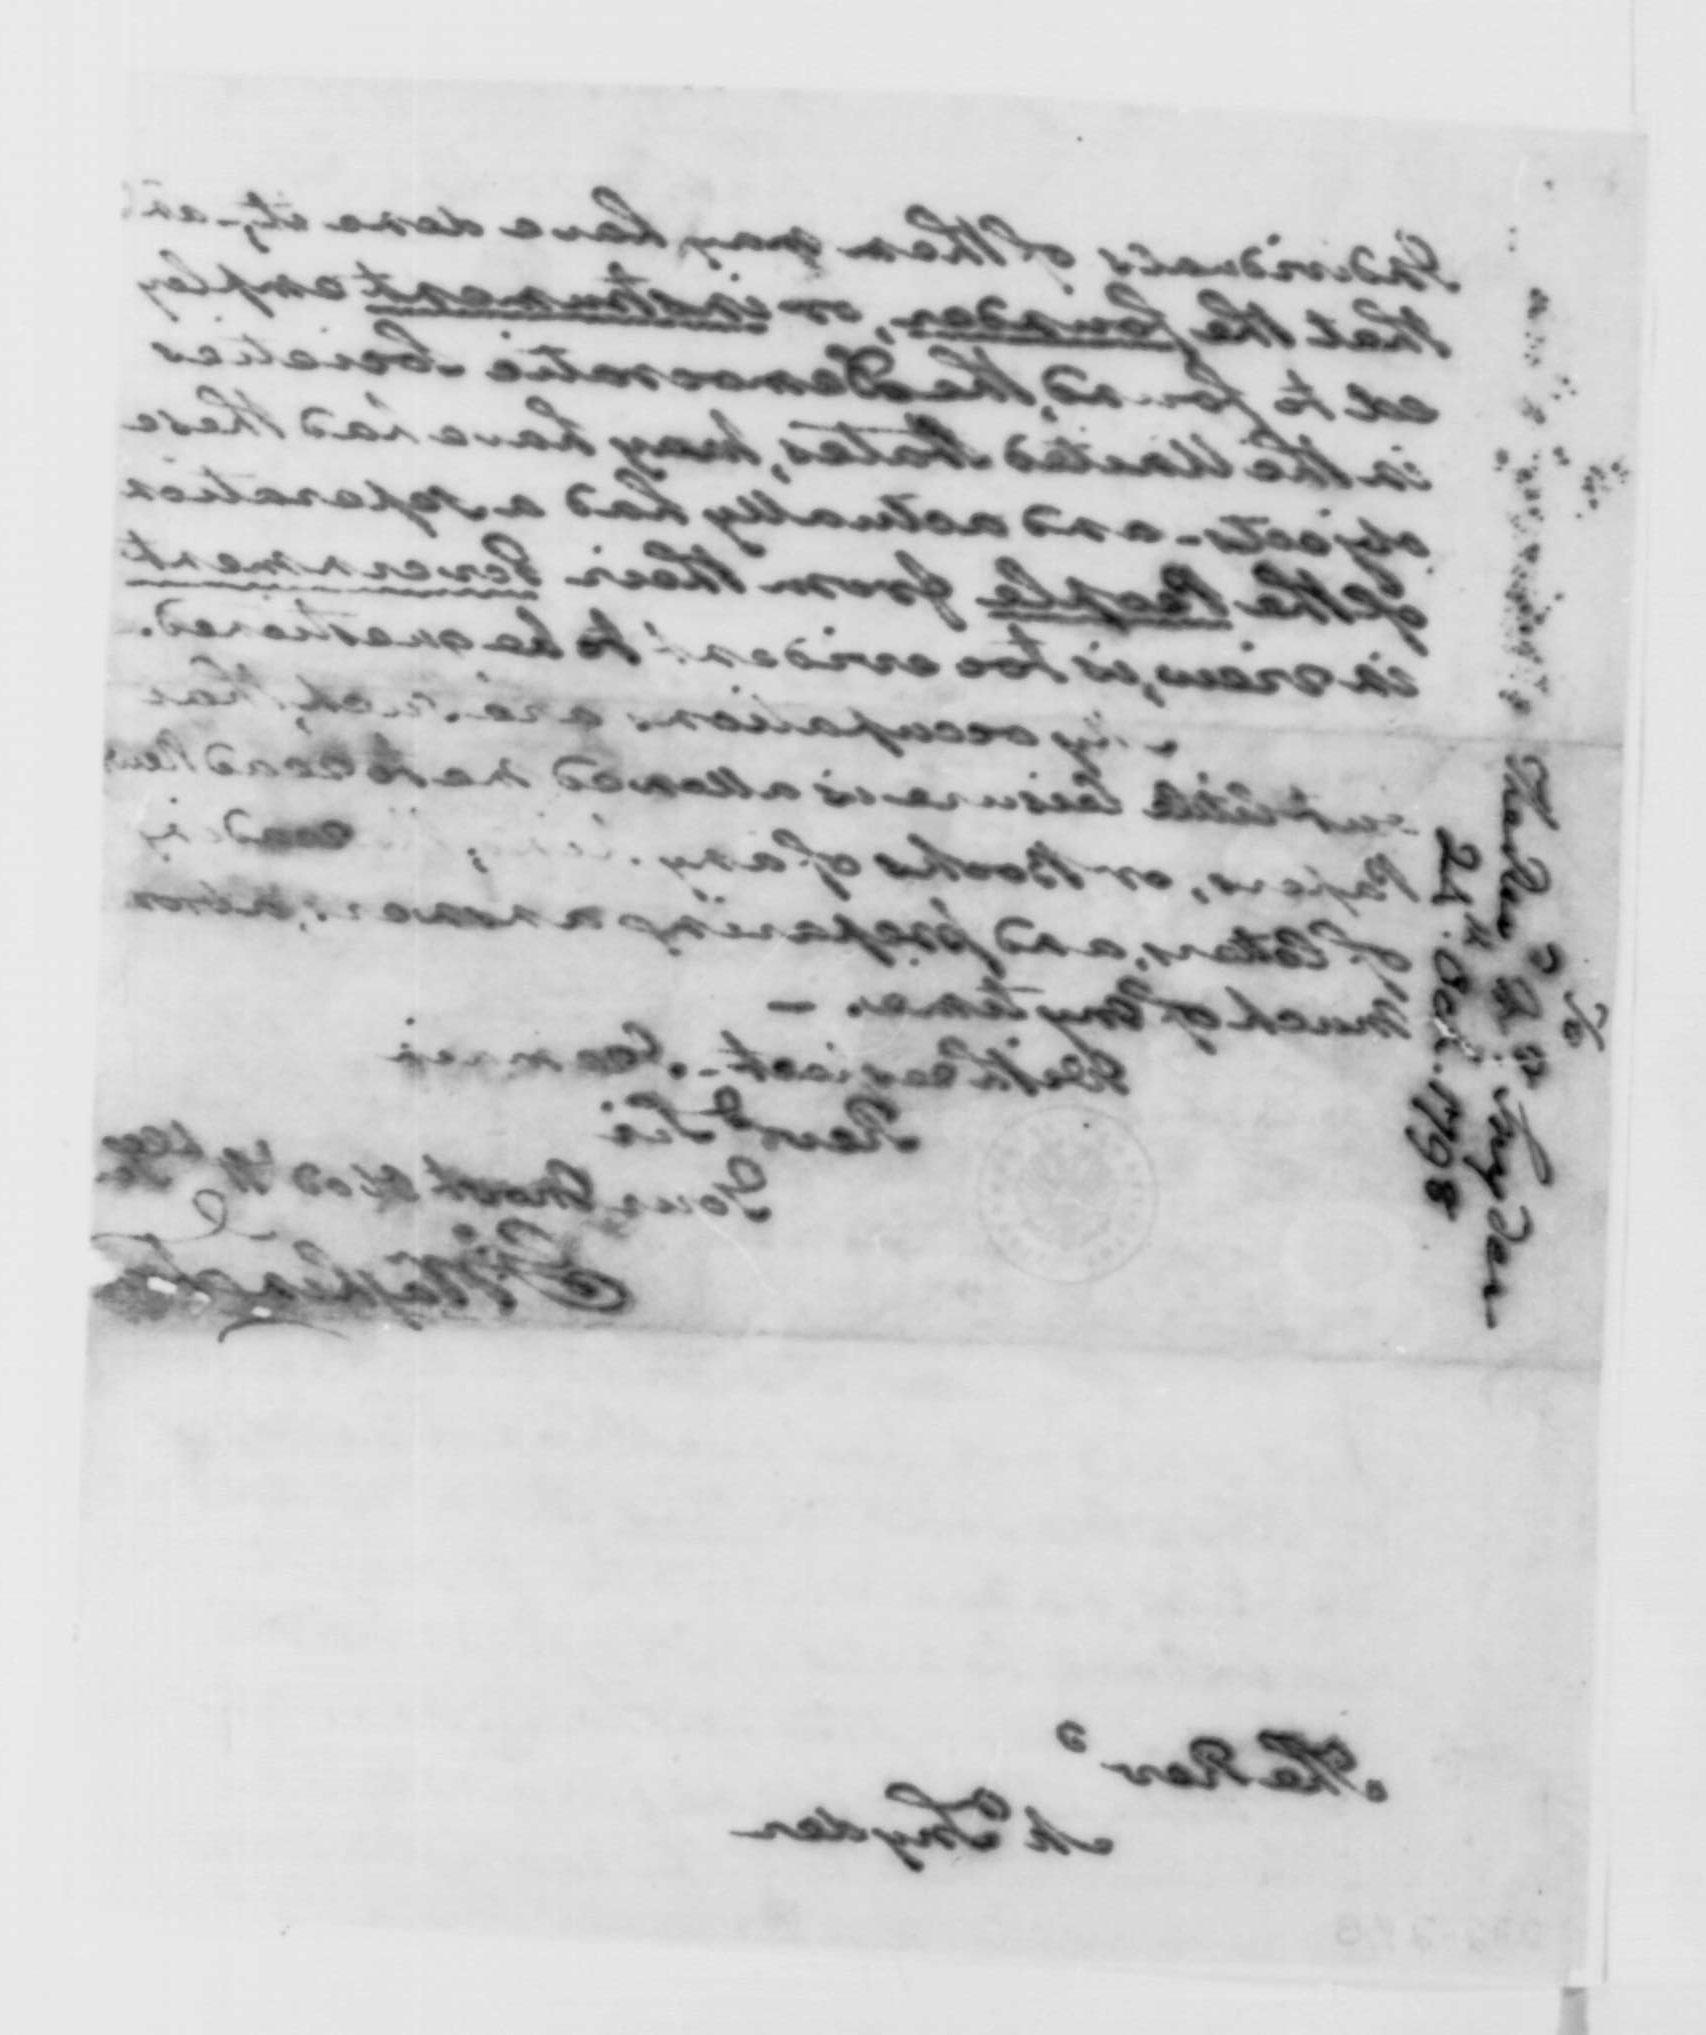 George Washington Illuminati Letter Oct 24th, 1798 - image 4 of 4